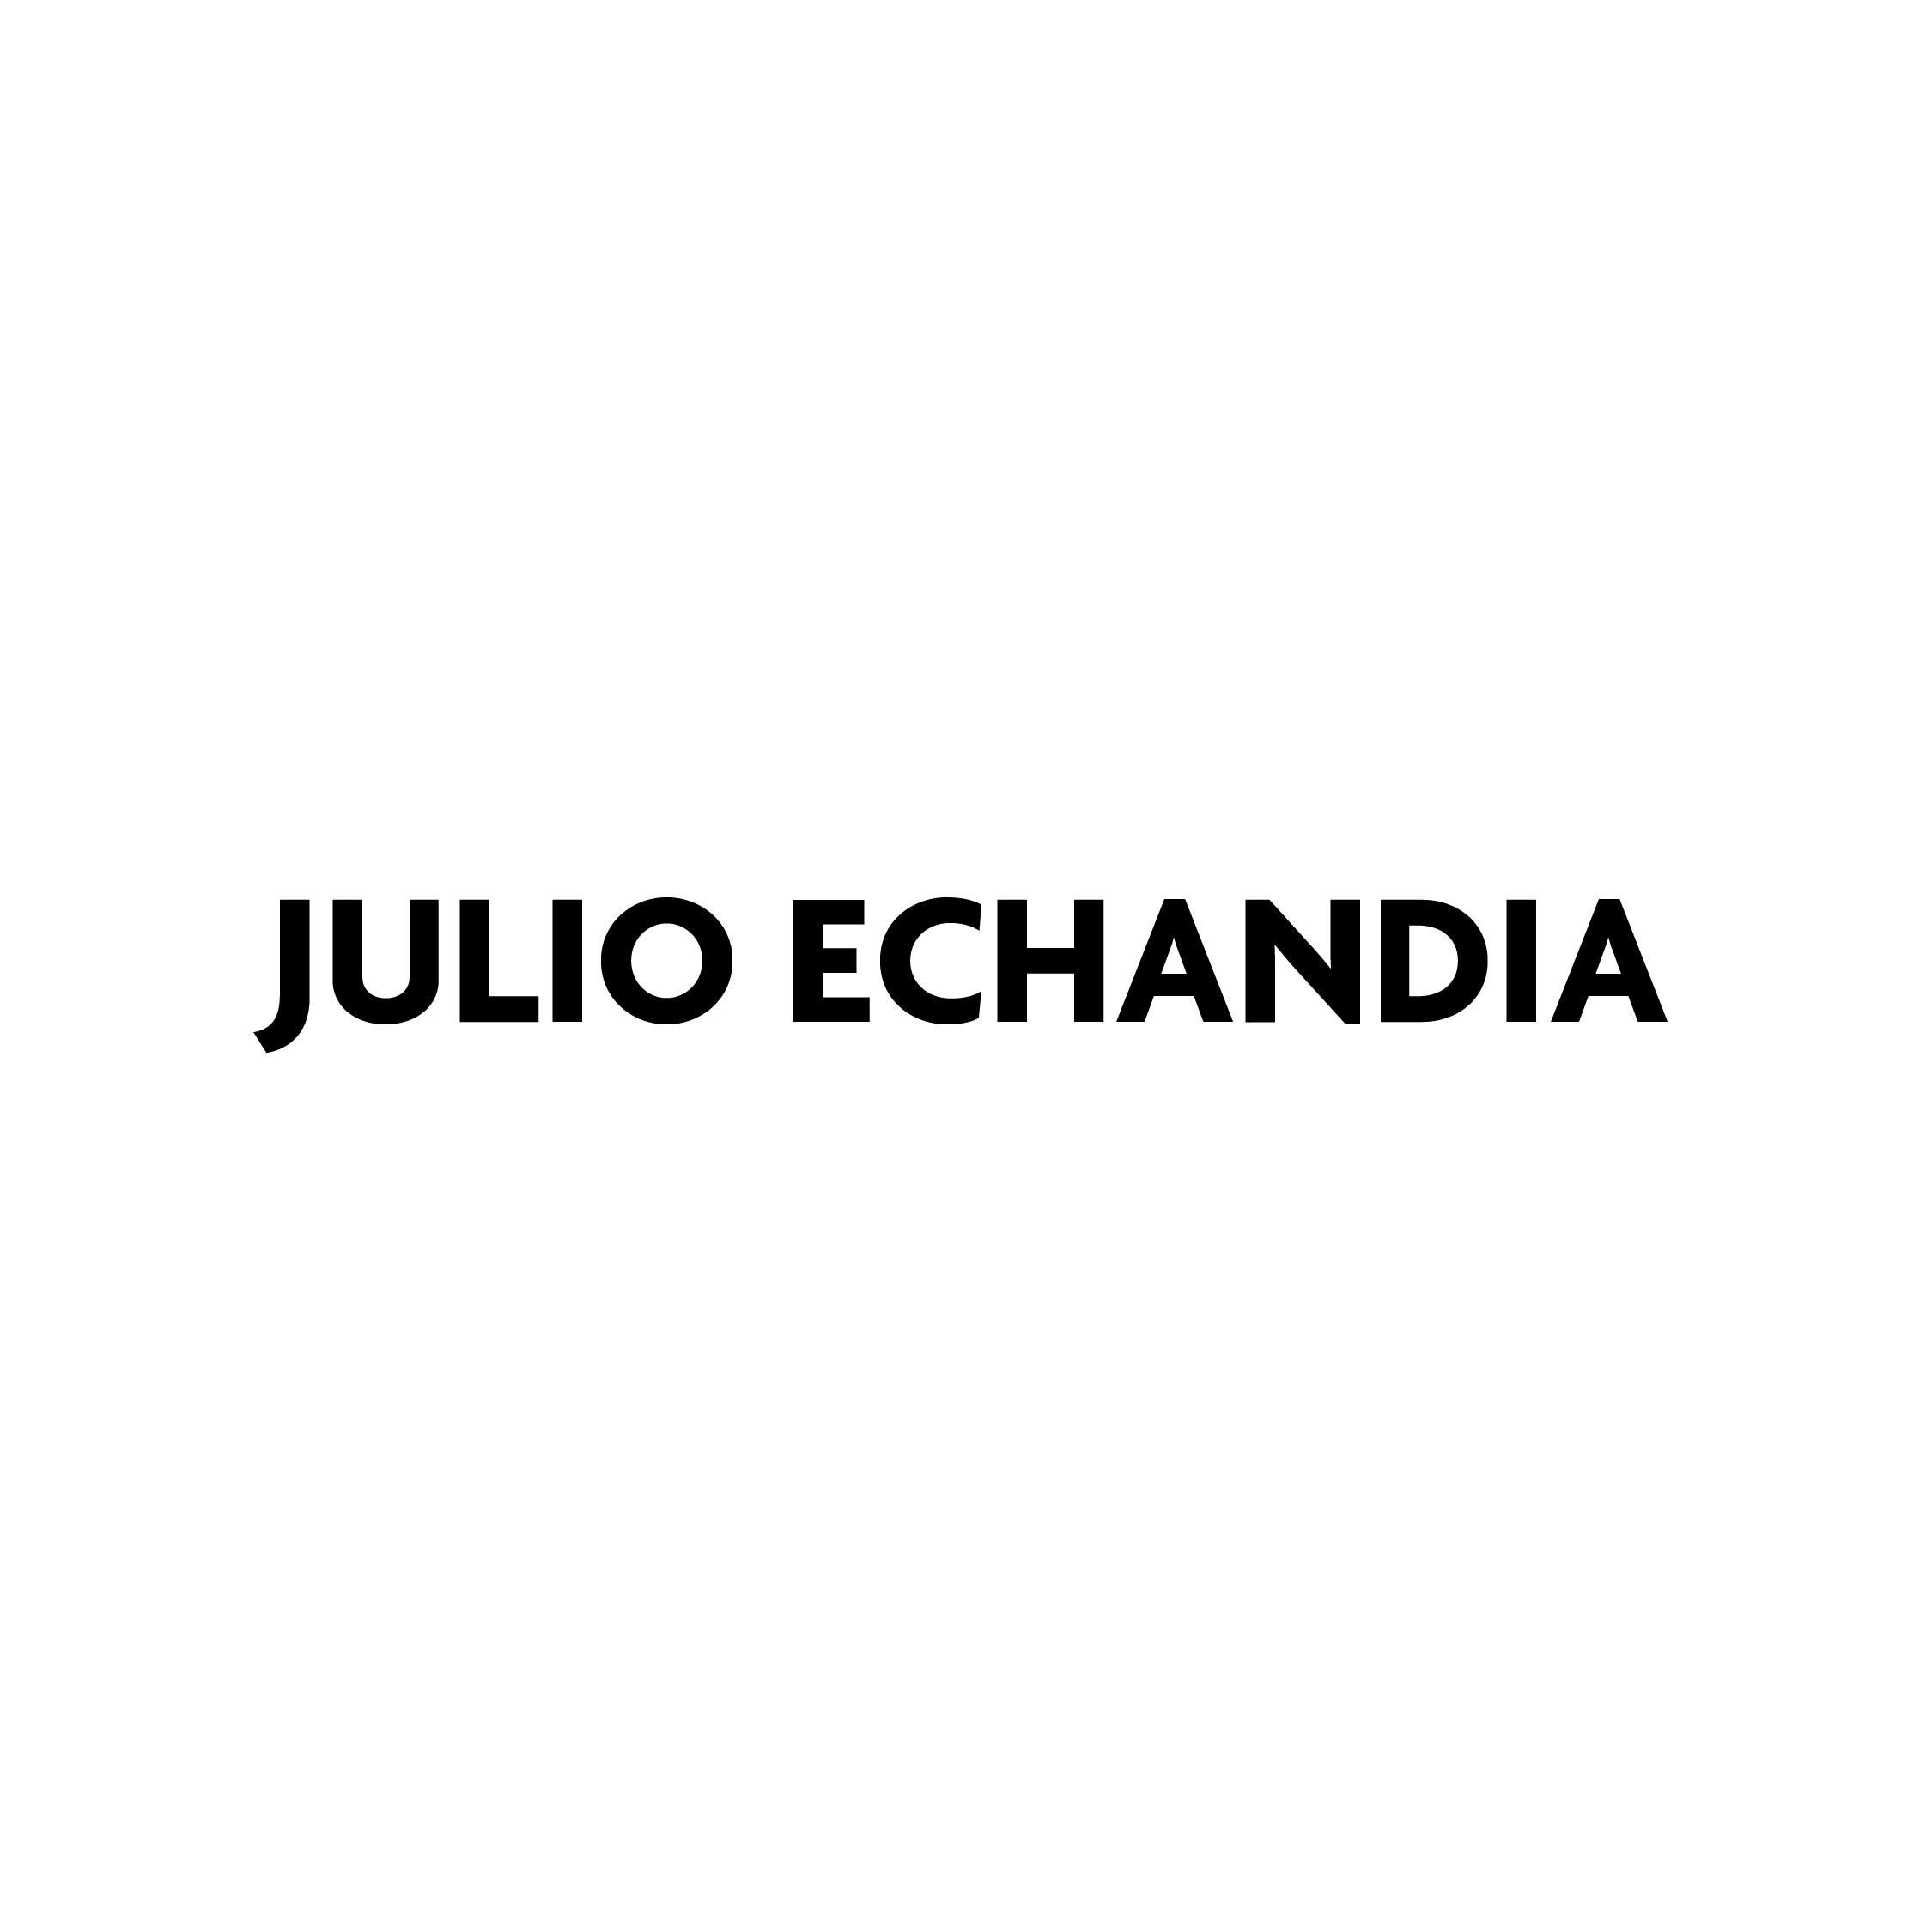 Julio Echandia